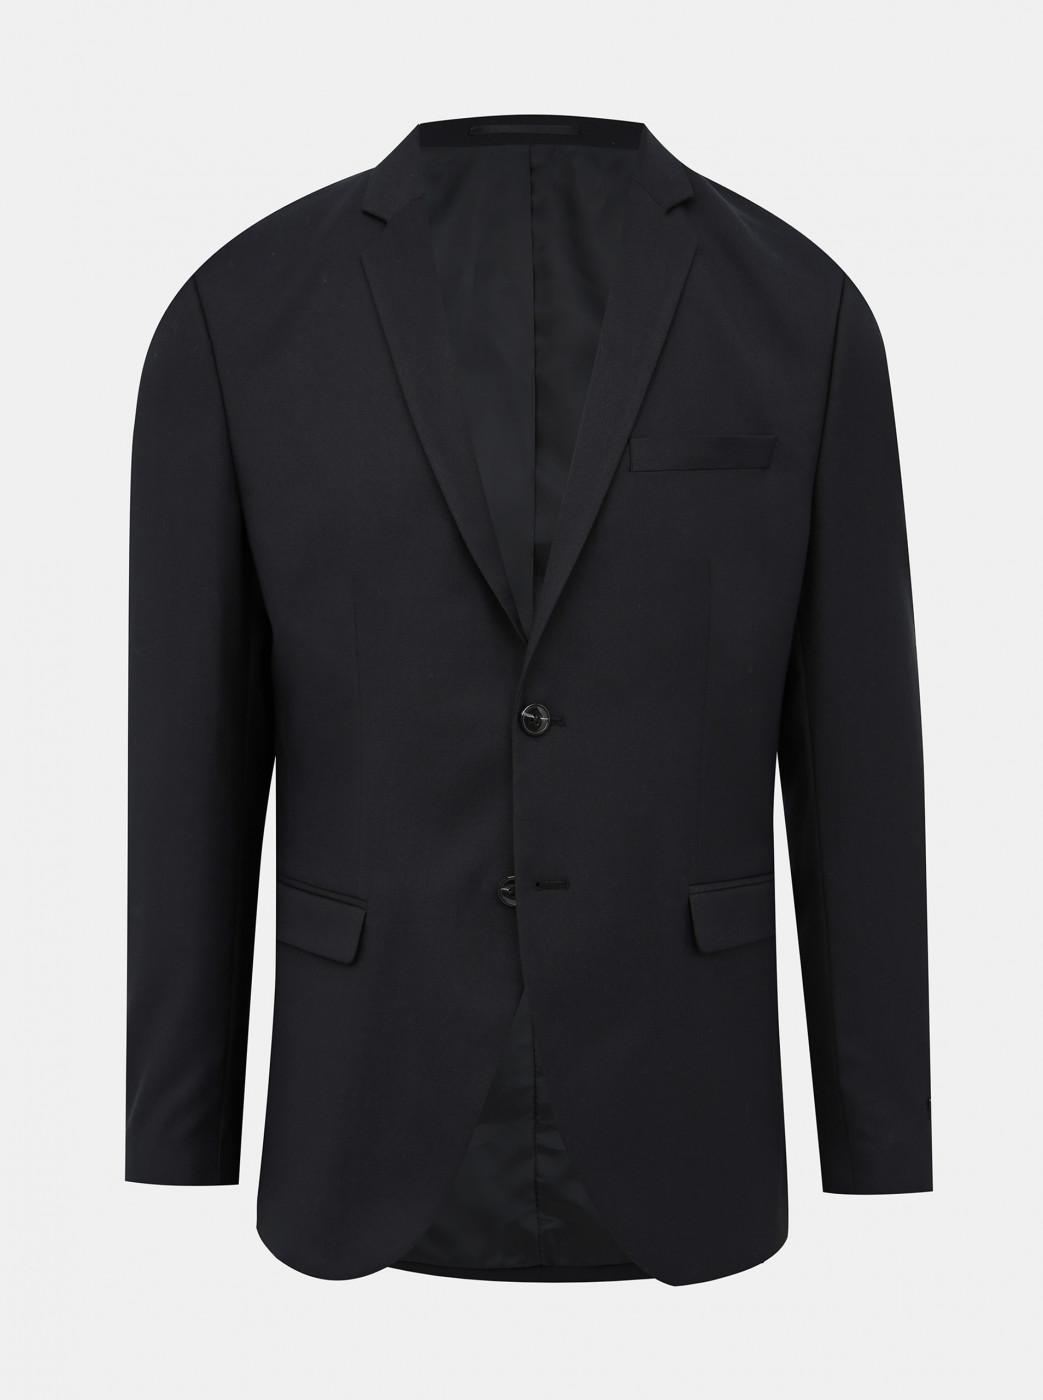 Black Suit Jacket with Admixture Of Hair Jack & Jones Solaris